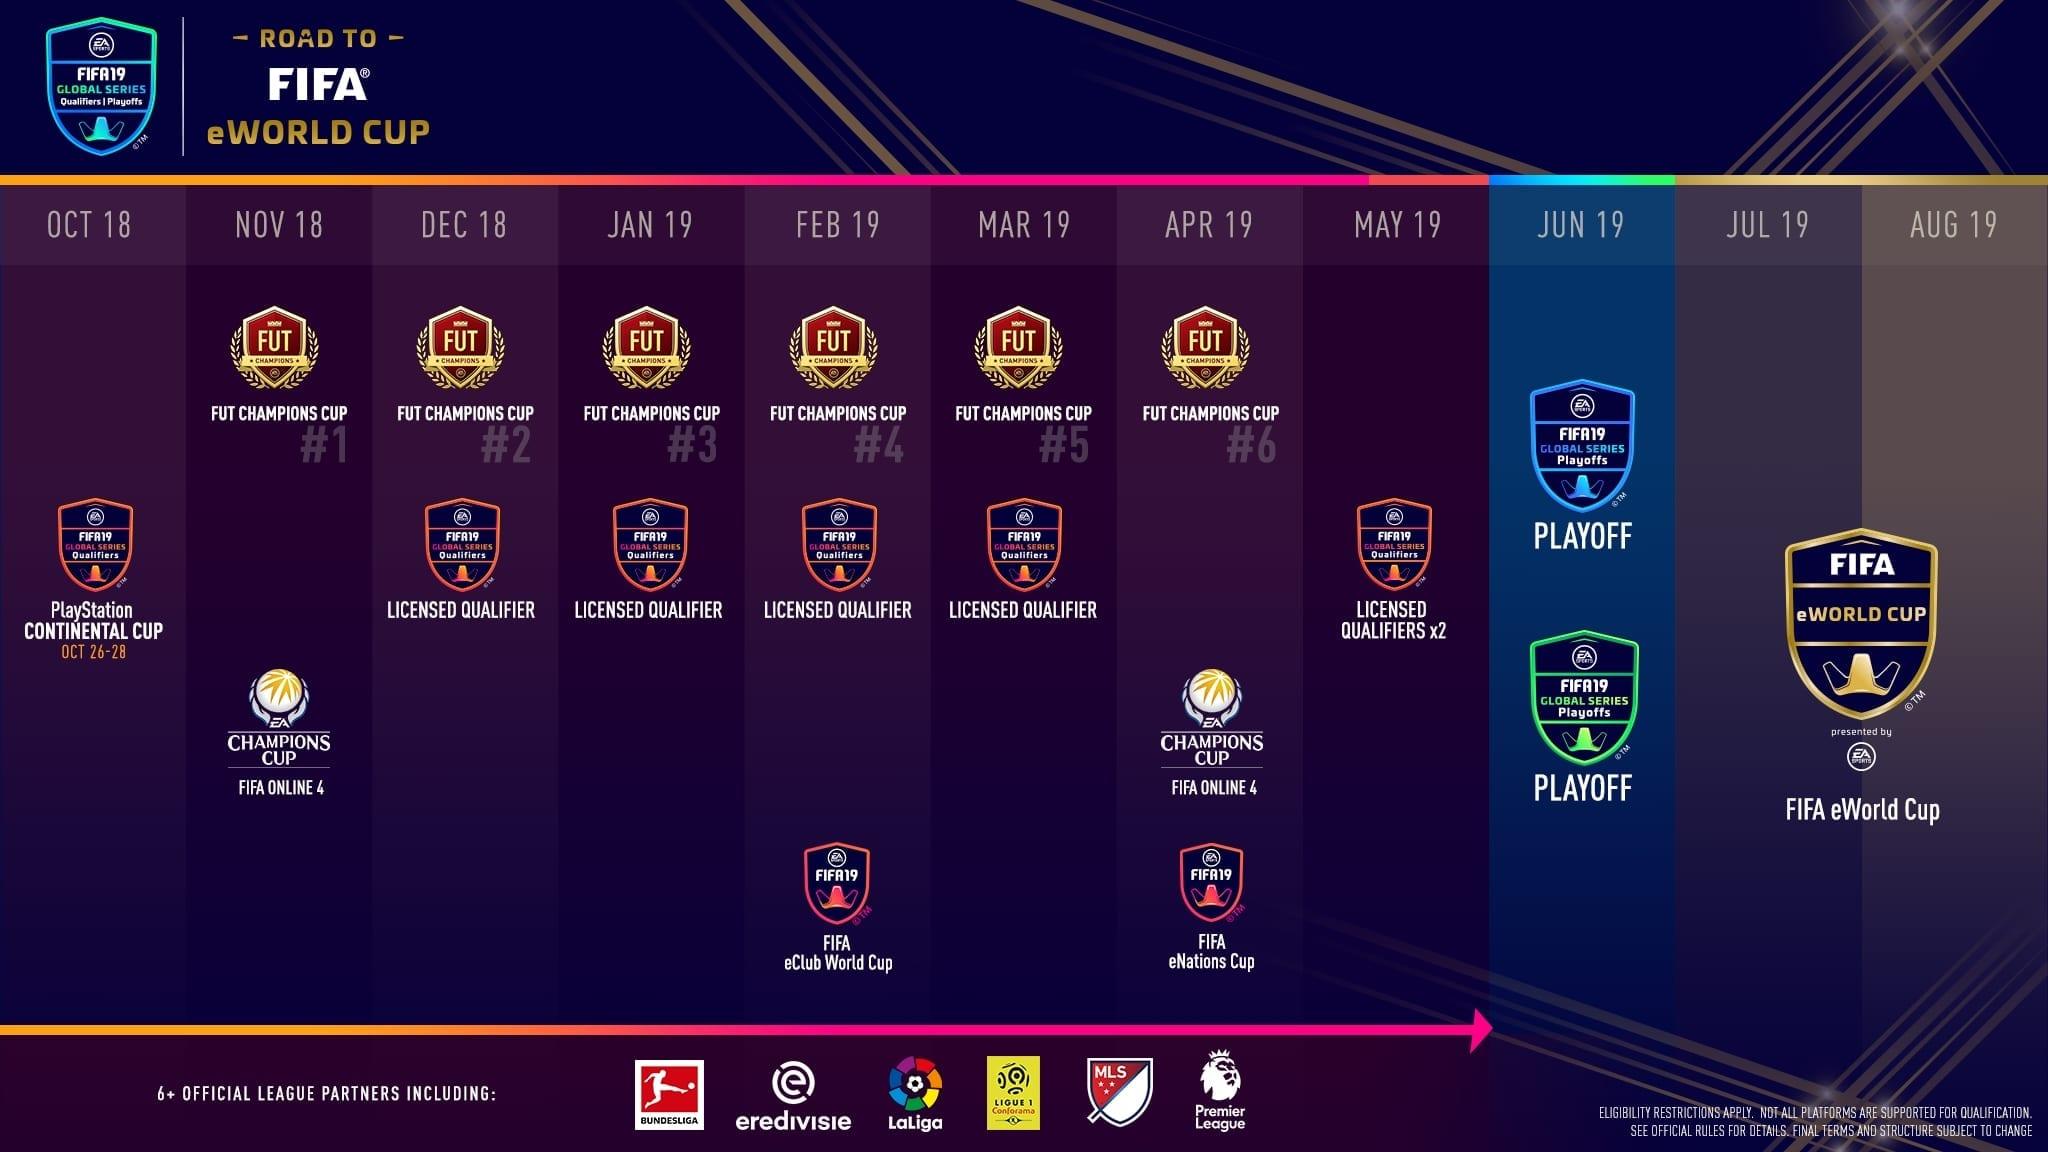 FIFA Global Schedule